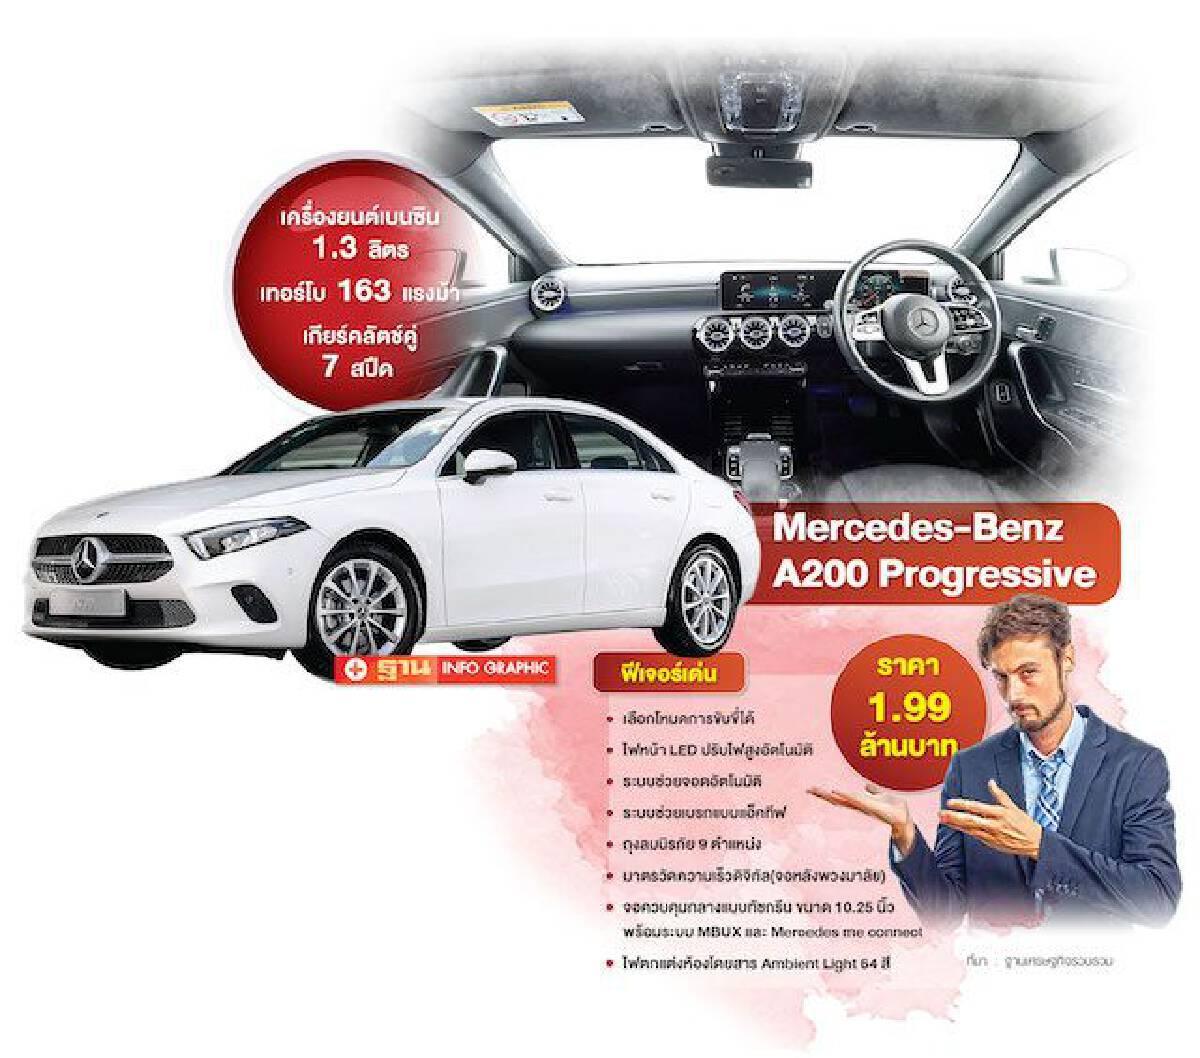 Mercedes-Benz A200 Progressive ราคา1.99 ล้านบาท